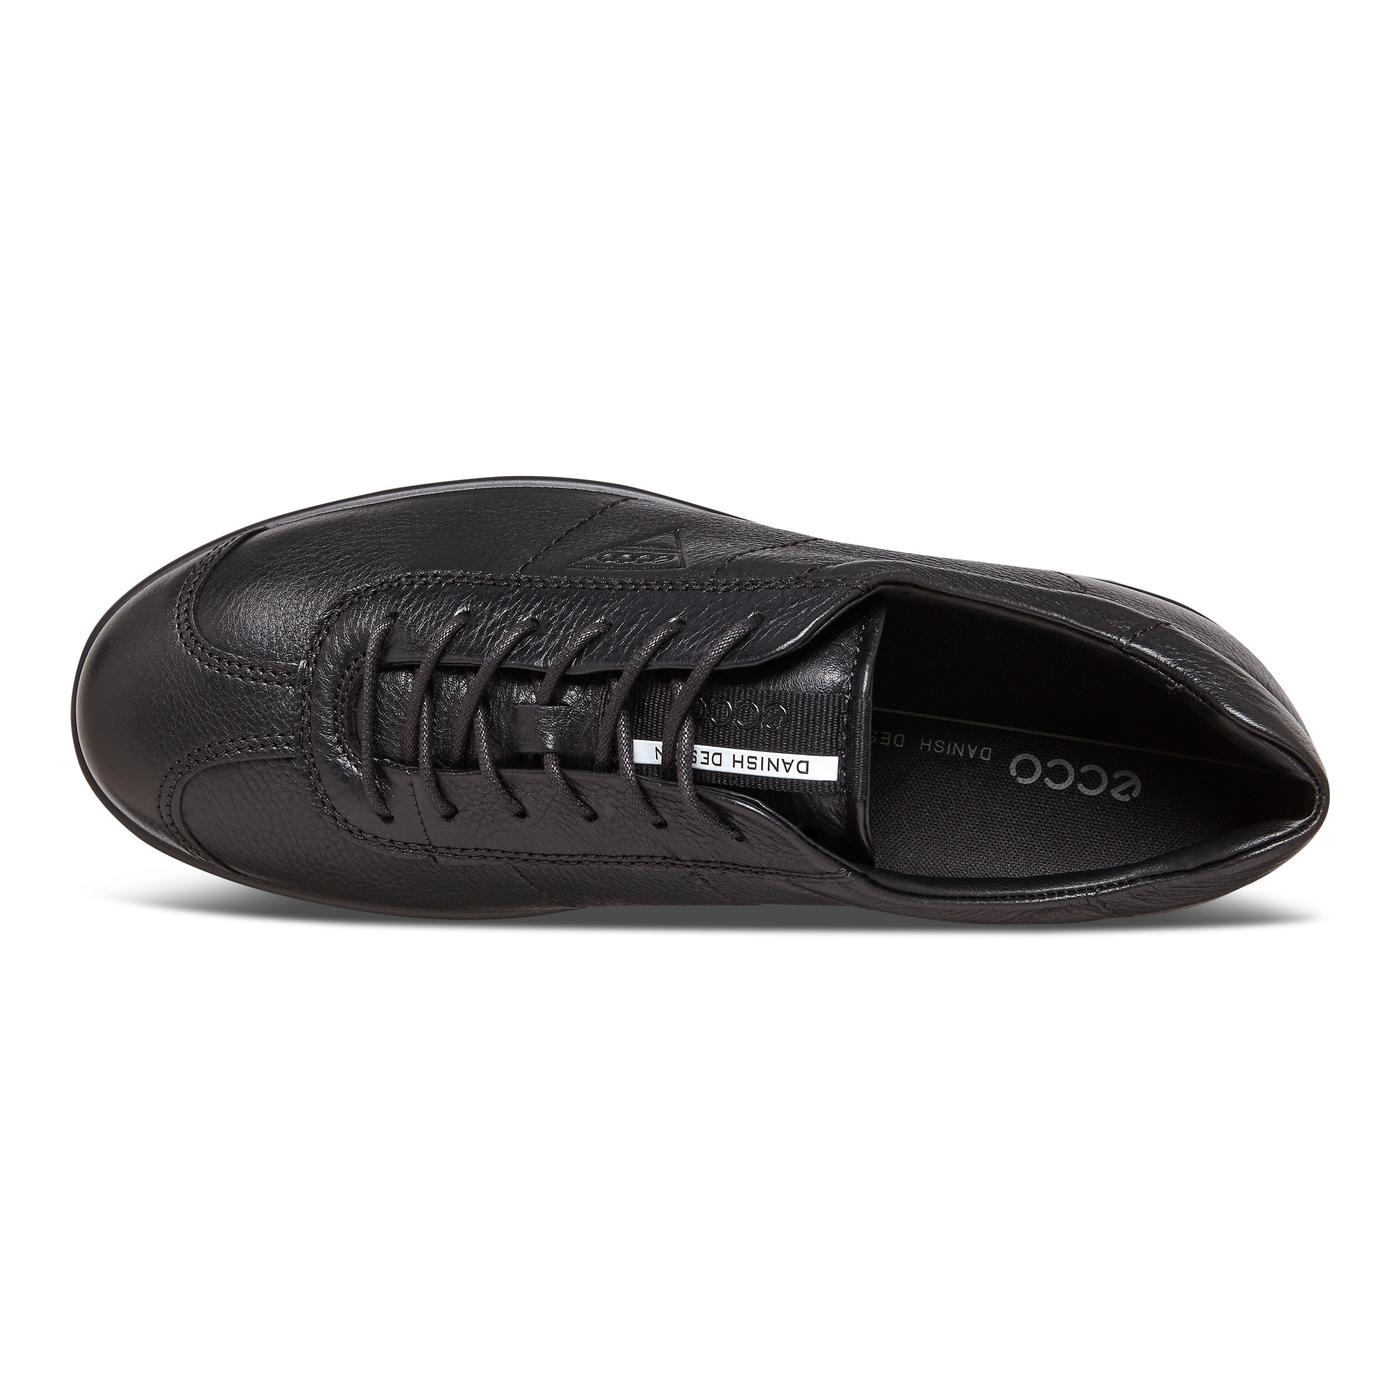 ECCO Mens Soft 1 Sneaker